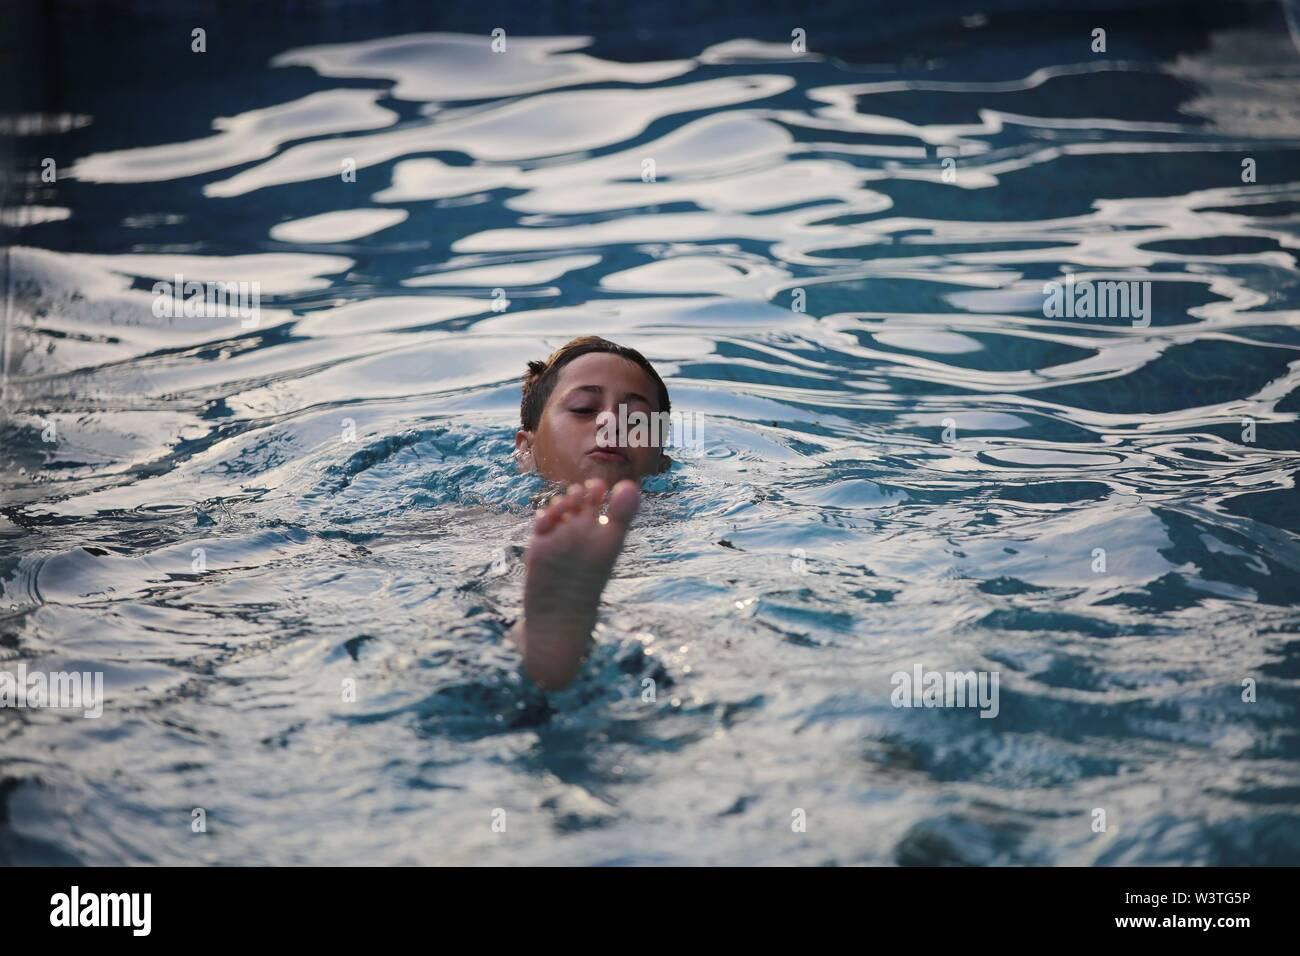 July 17, 2019 - Gaza City, The Gaza Strip, Palestine - Palestinian children play at a swimming pool on a hot day in the Gaza Strip. (Credit Image: © Hassan Jedi/Quds Net News via ZUMA Wire) - Stock Image